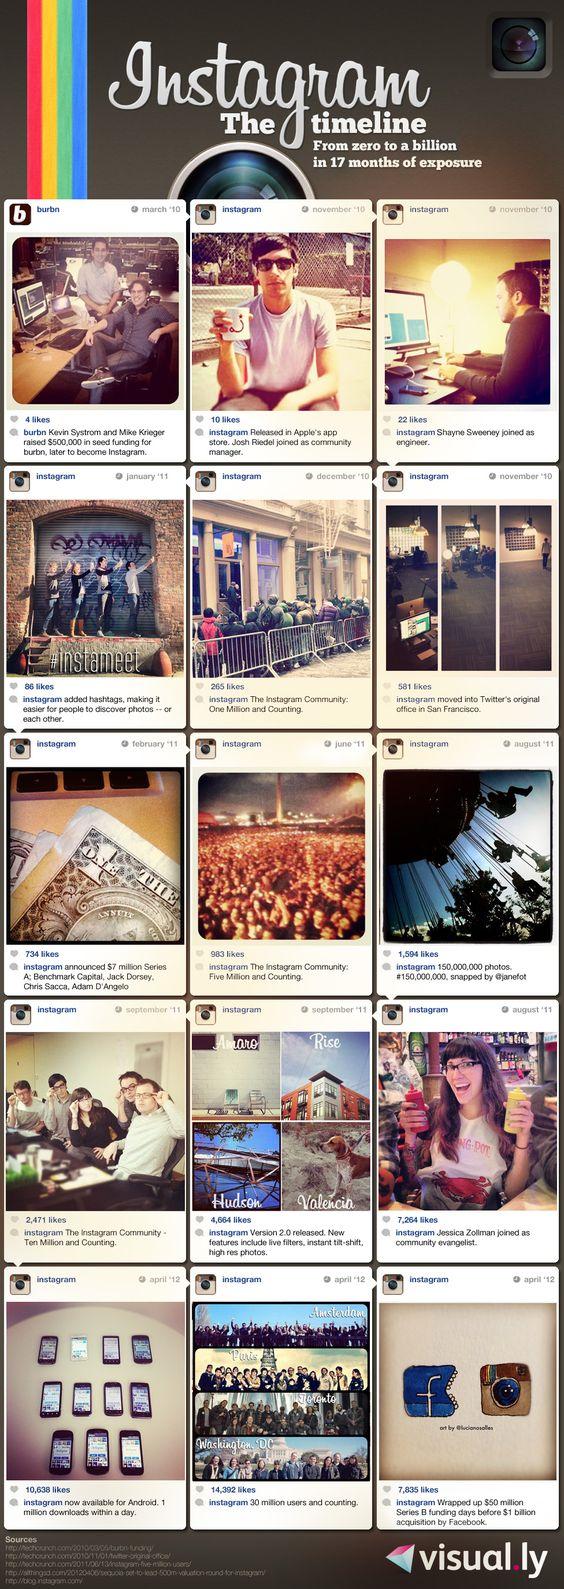 Instagram timeline: from Zero to $1Billion in 17months.  via @mashable